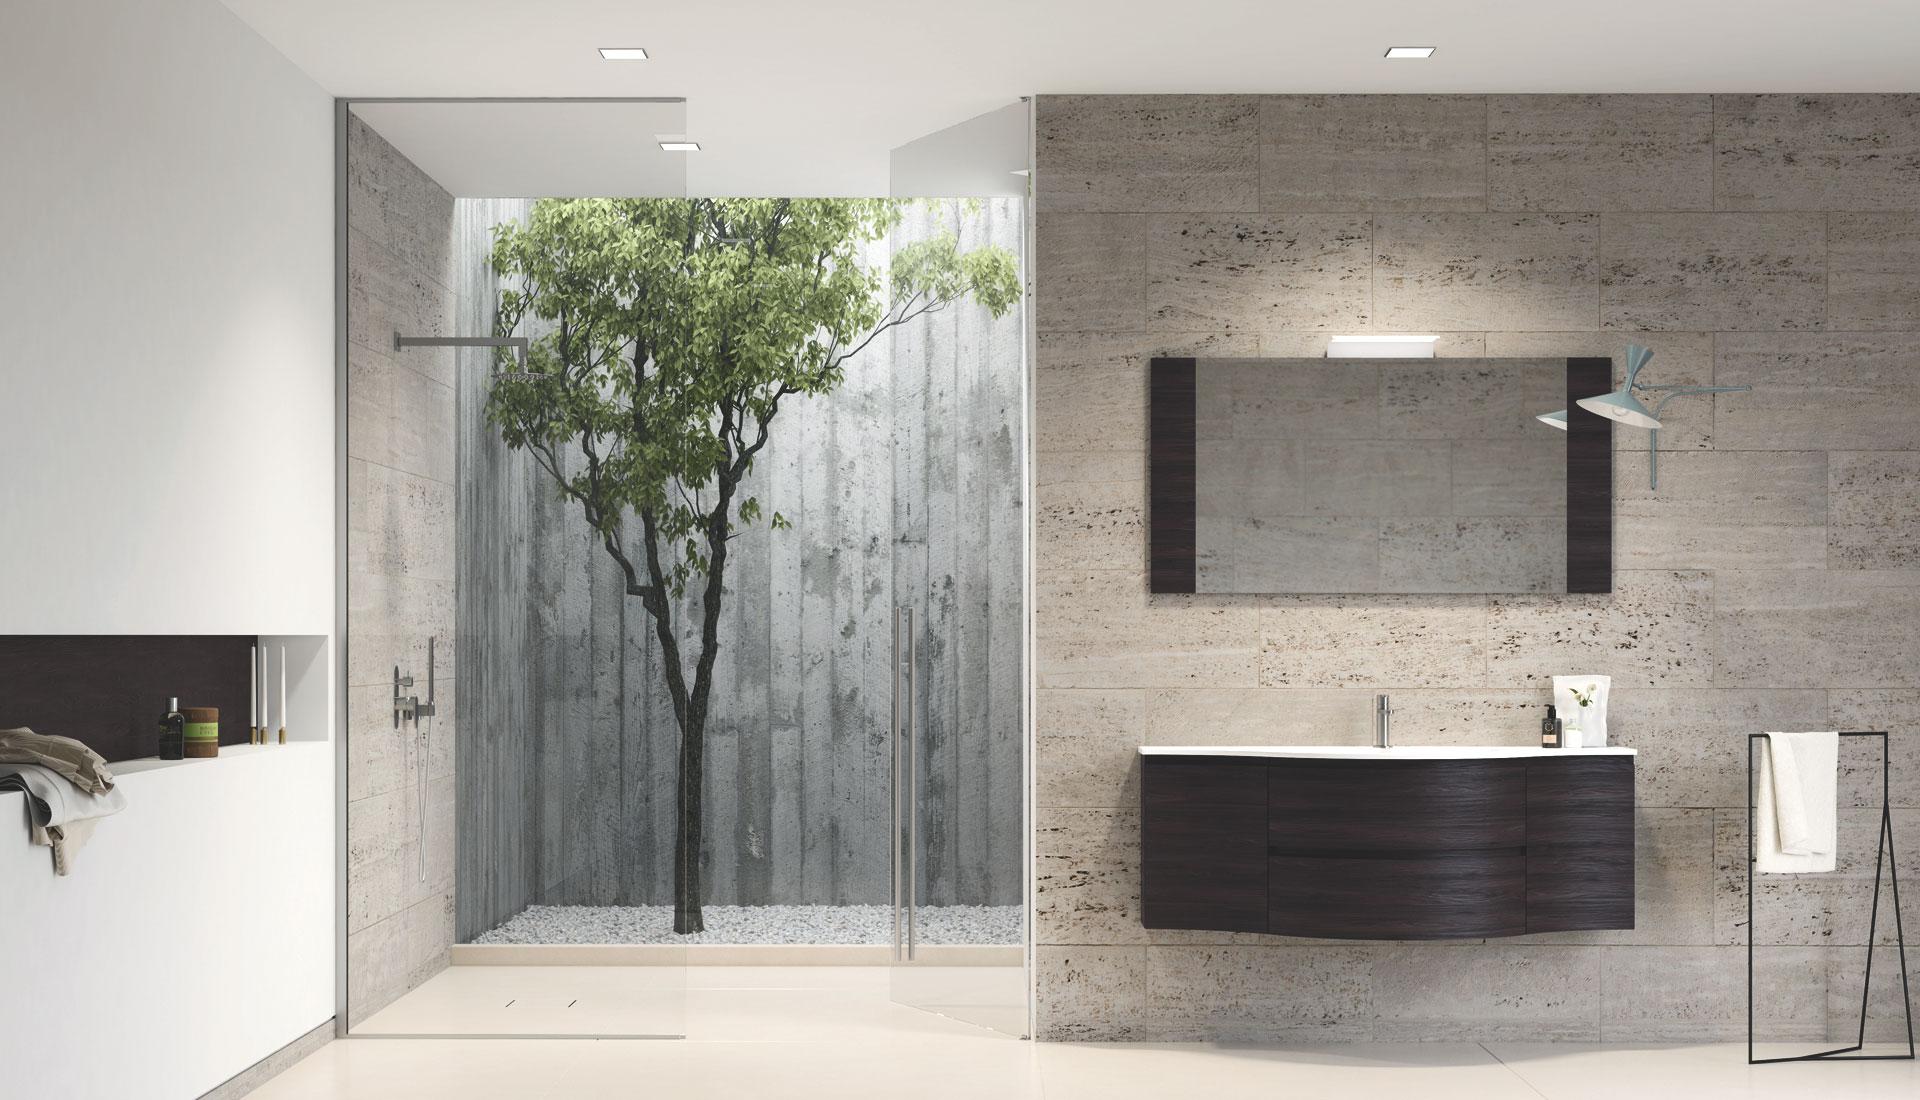 Salle de bain avec meubles arrondis